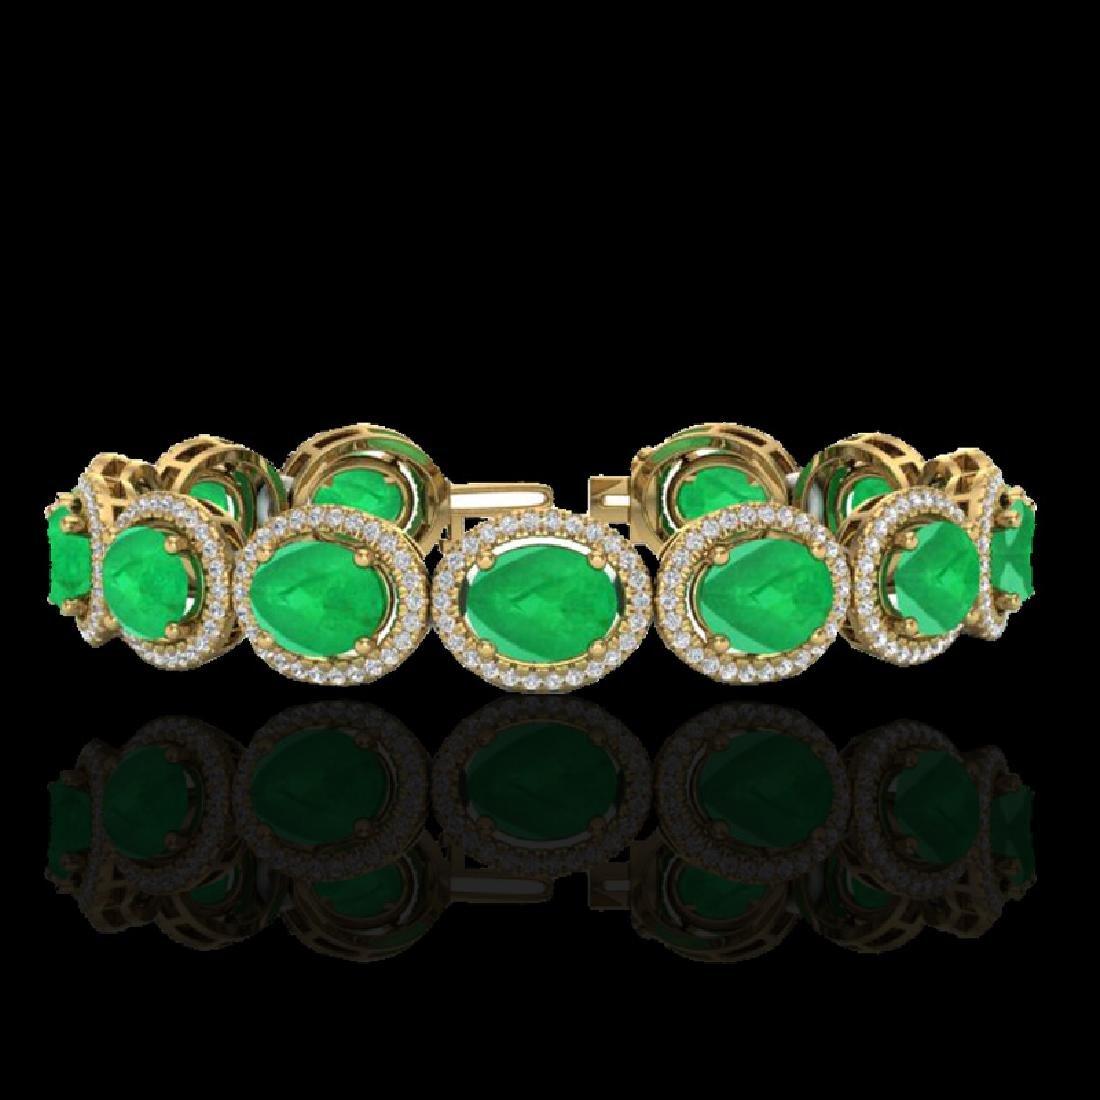 30 CTW Emerald & Micro Pave VS/SI Diamond Bracelet 10K